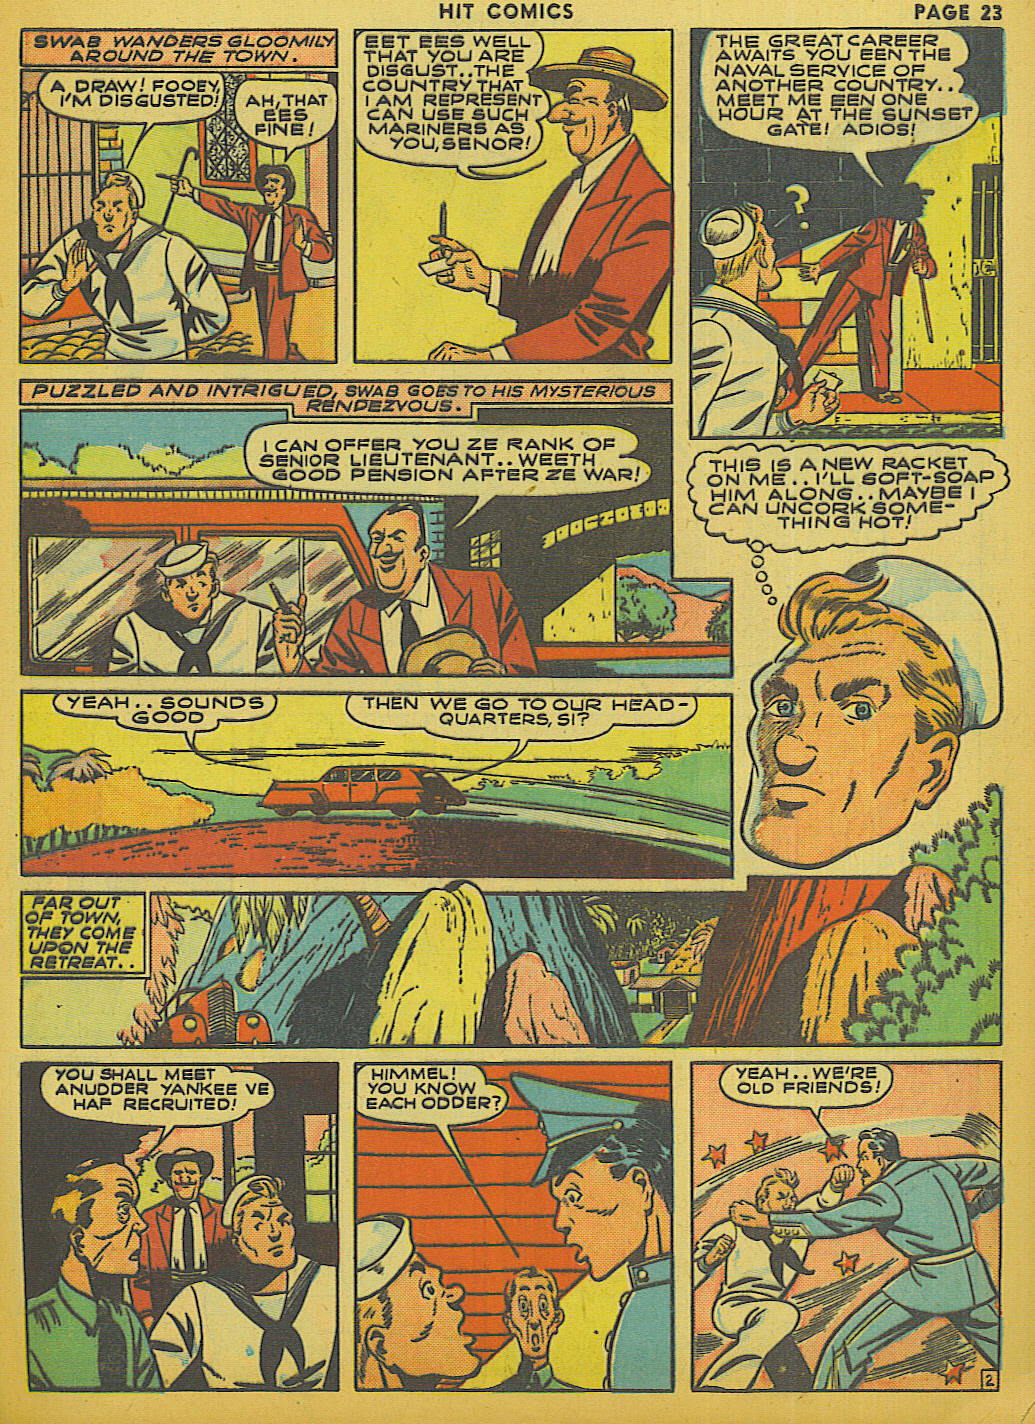 Read online Hit Comics comic -  Issue #13 - 25